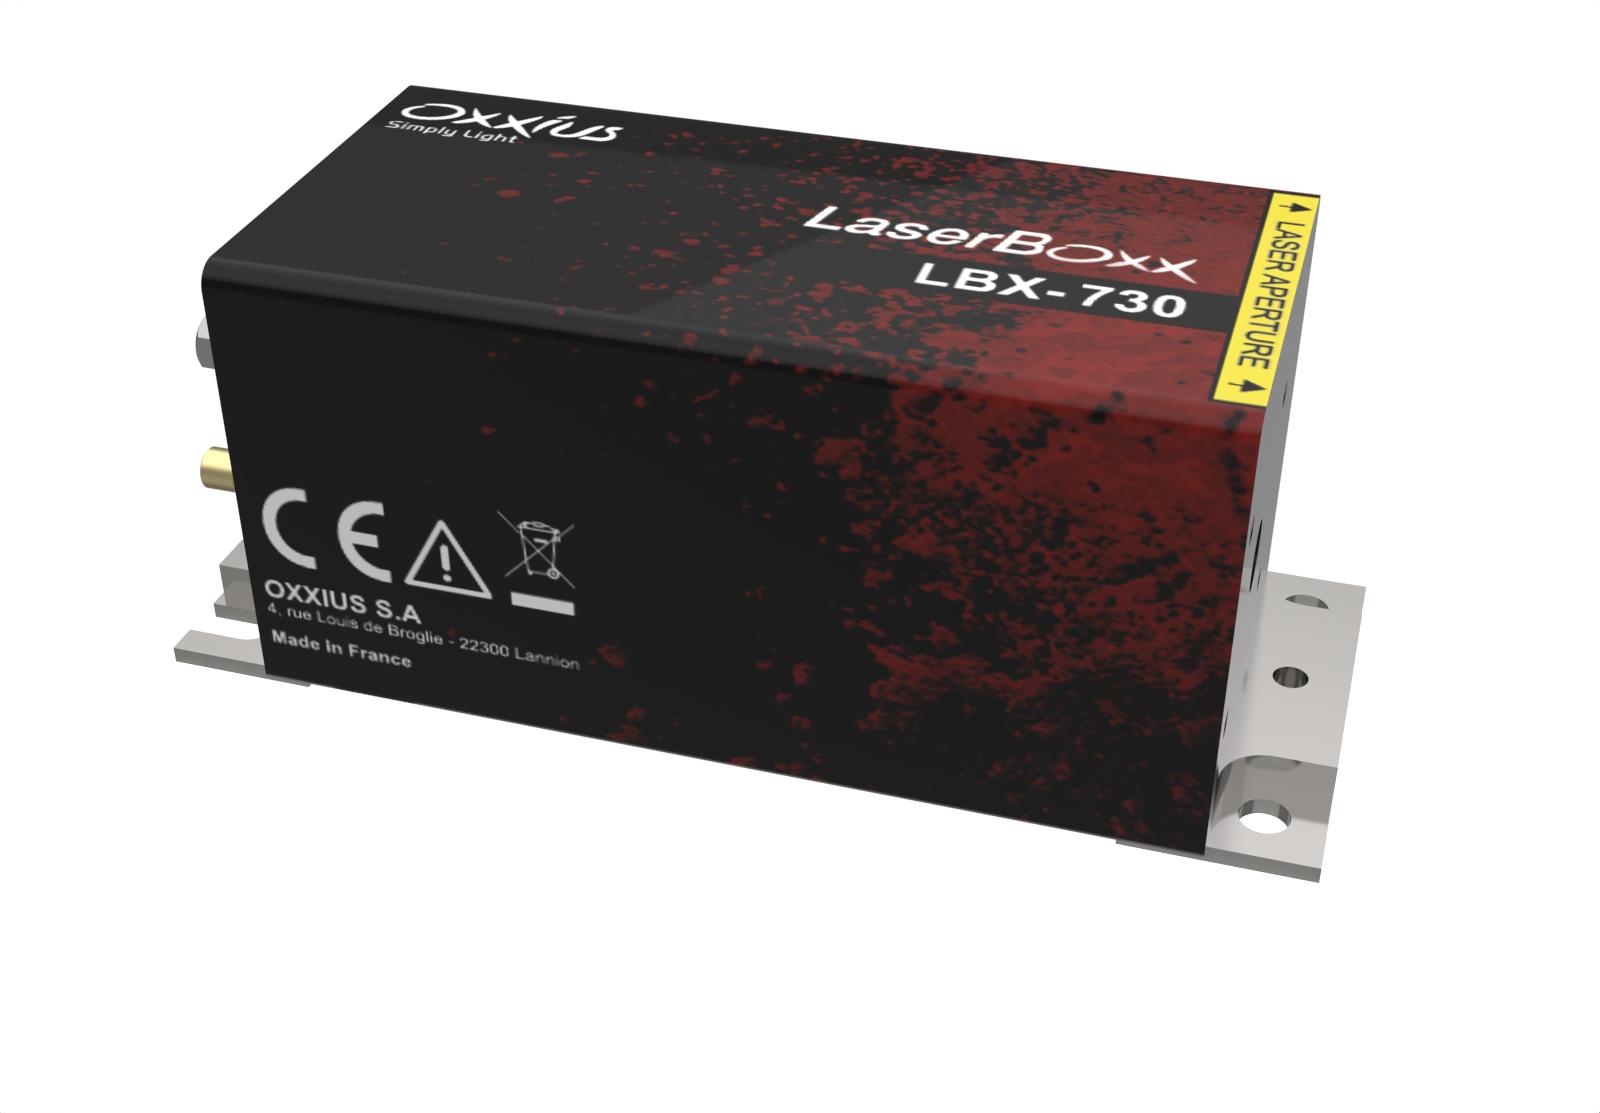 LBX-730-40-CSB: 730nm Laser Diode Module